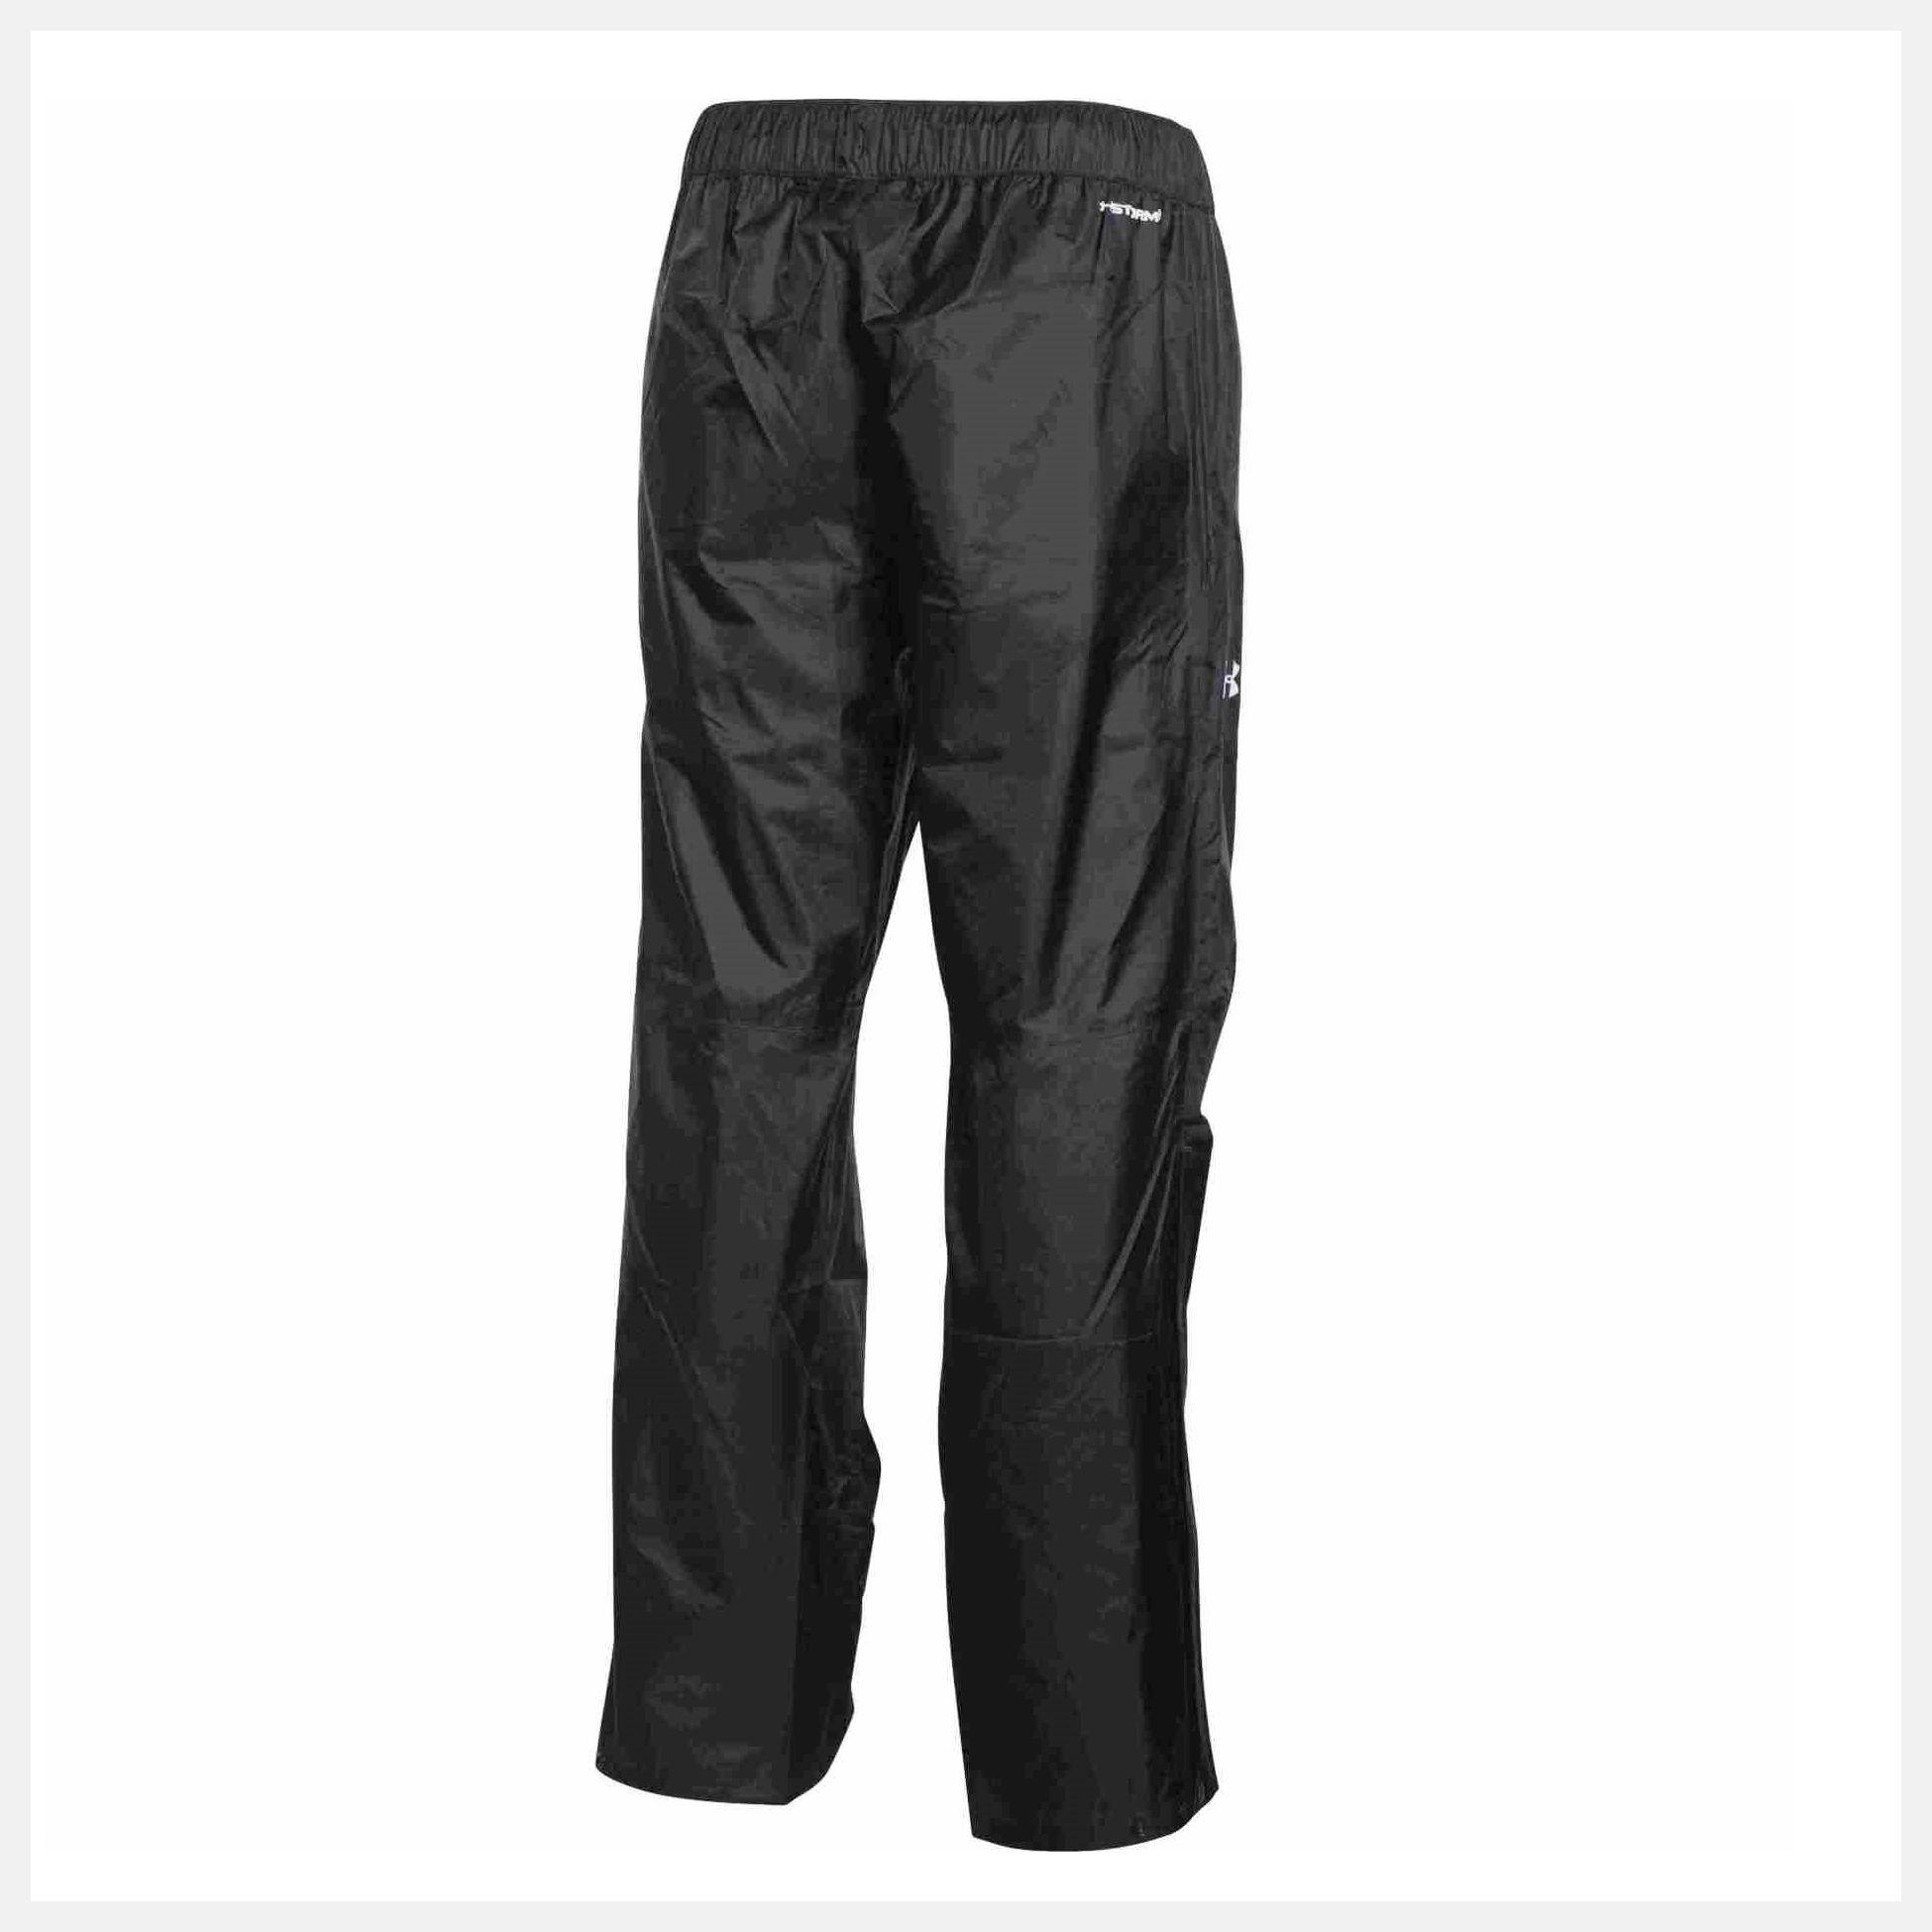 Clothing -  under armour UA Storm Surge Pant 3693